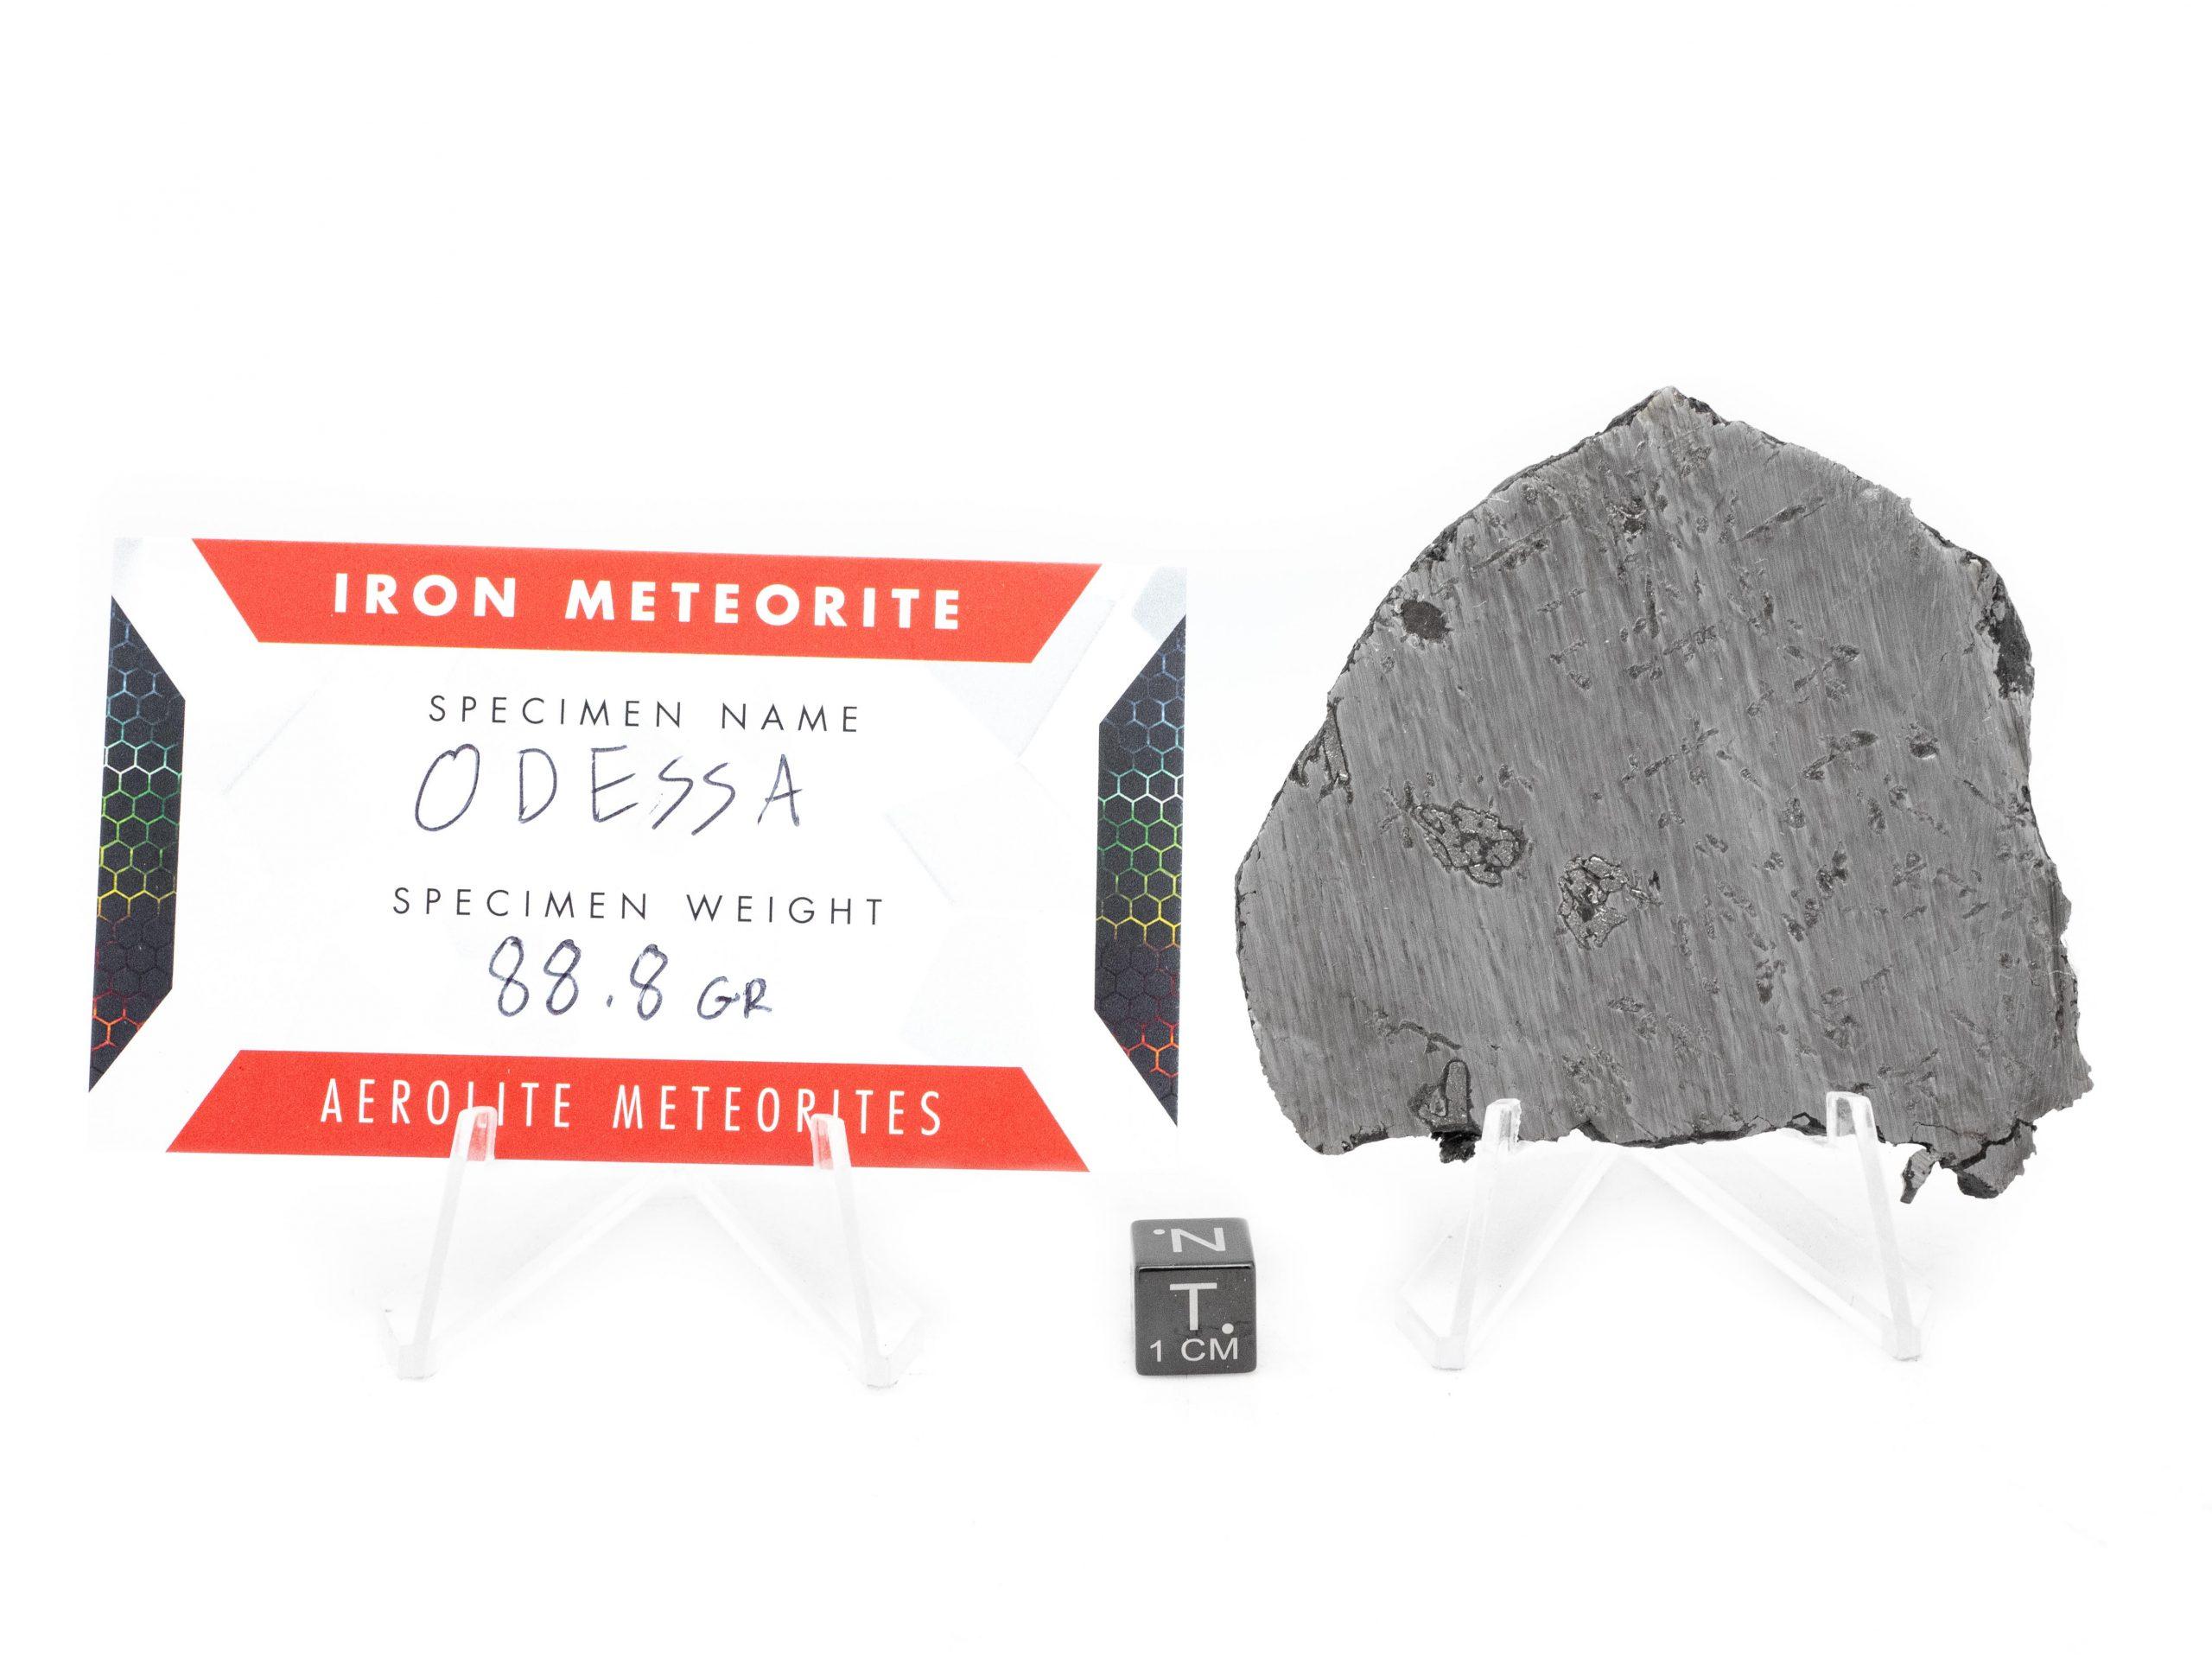 Odessa 88 8 2